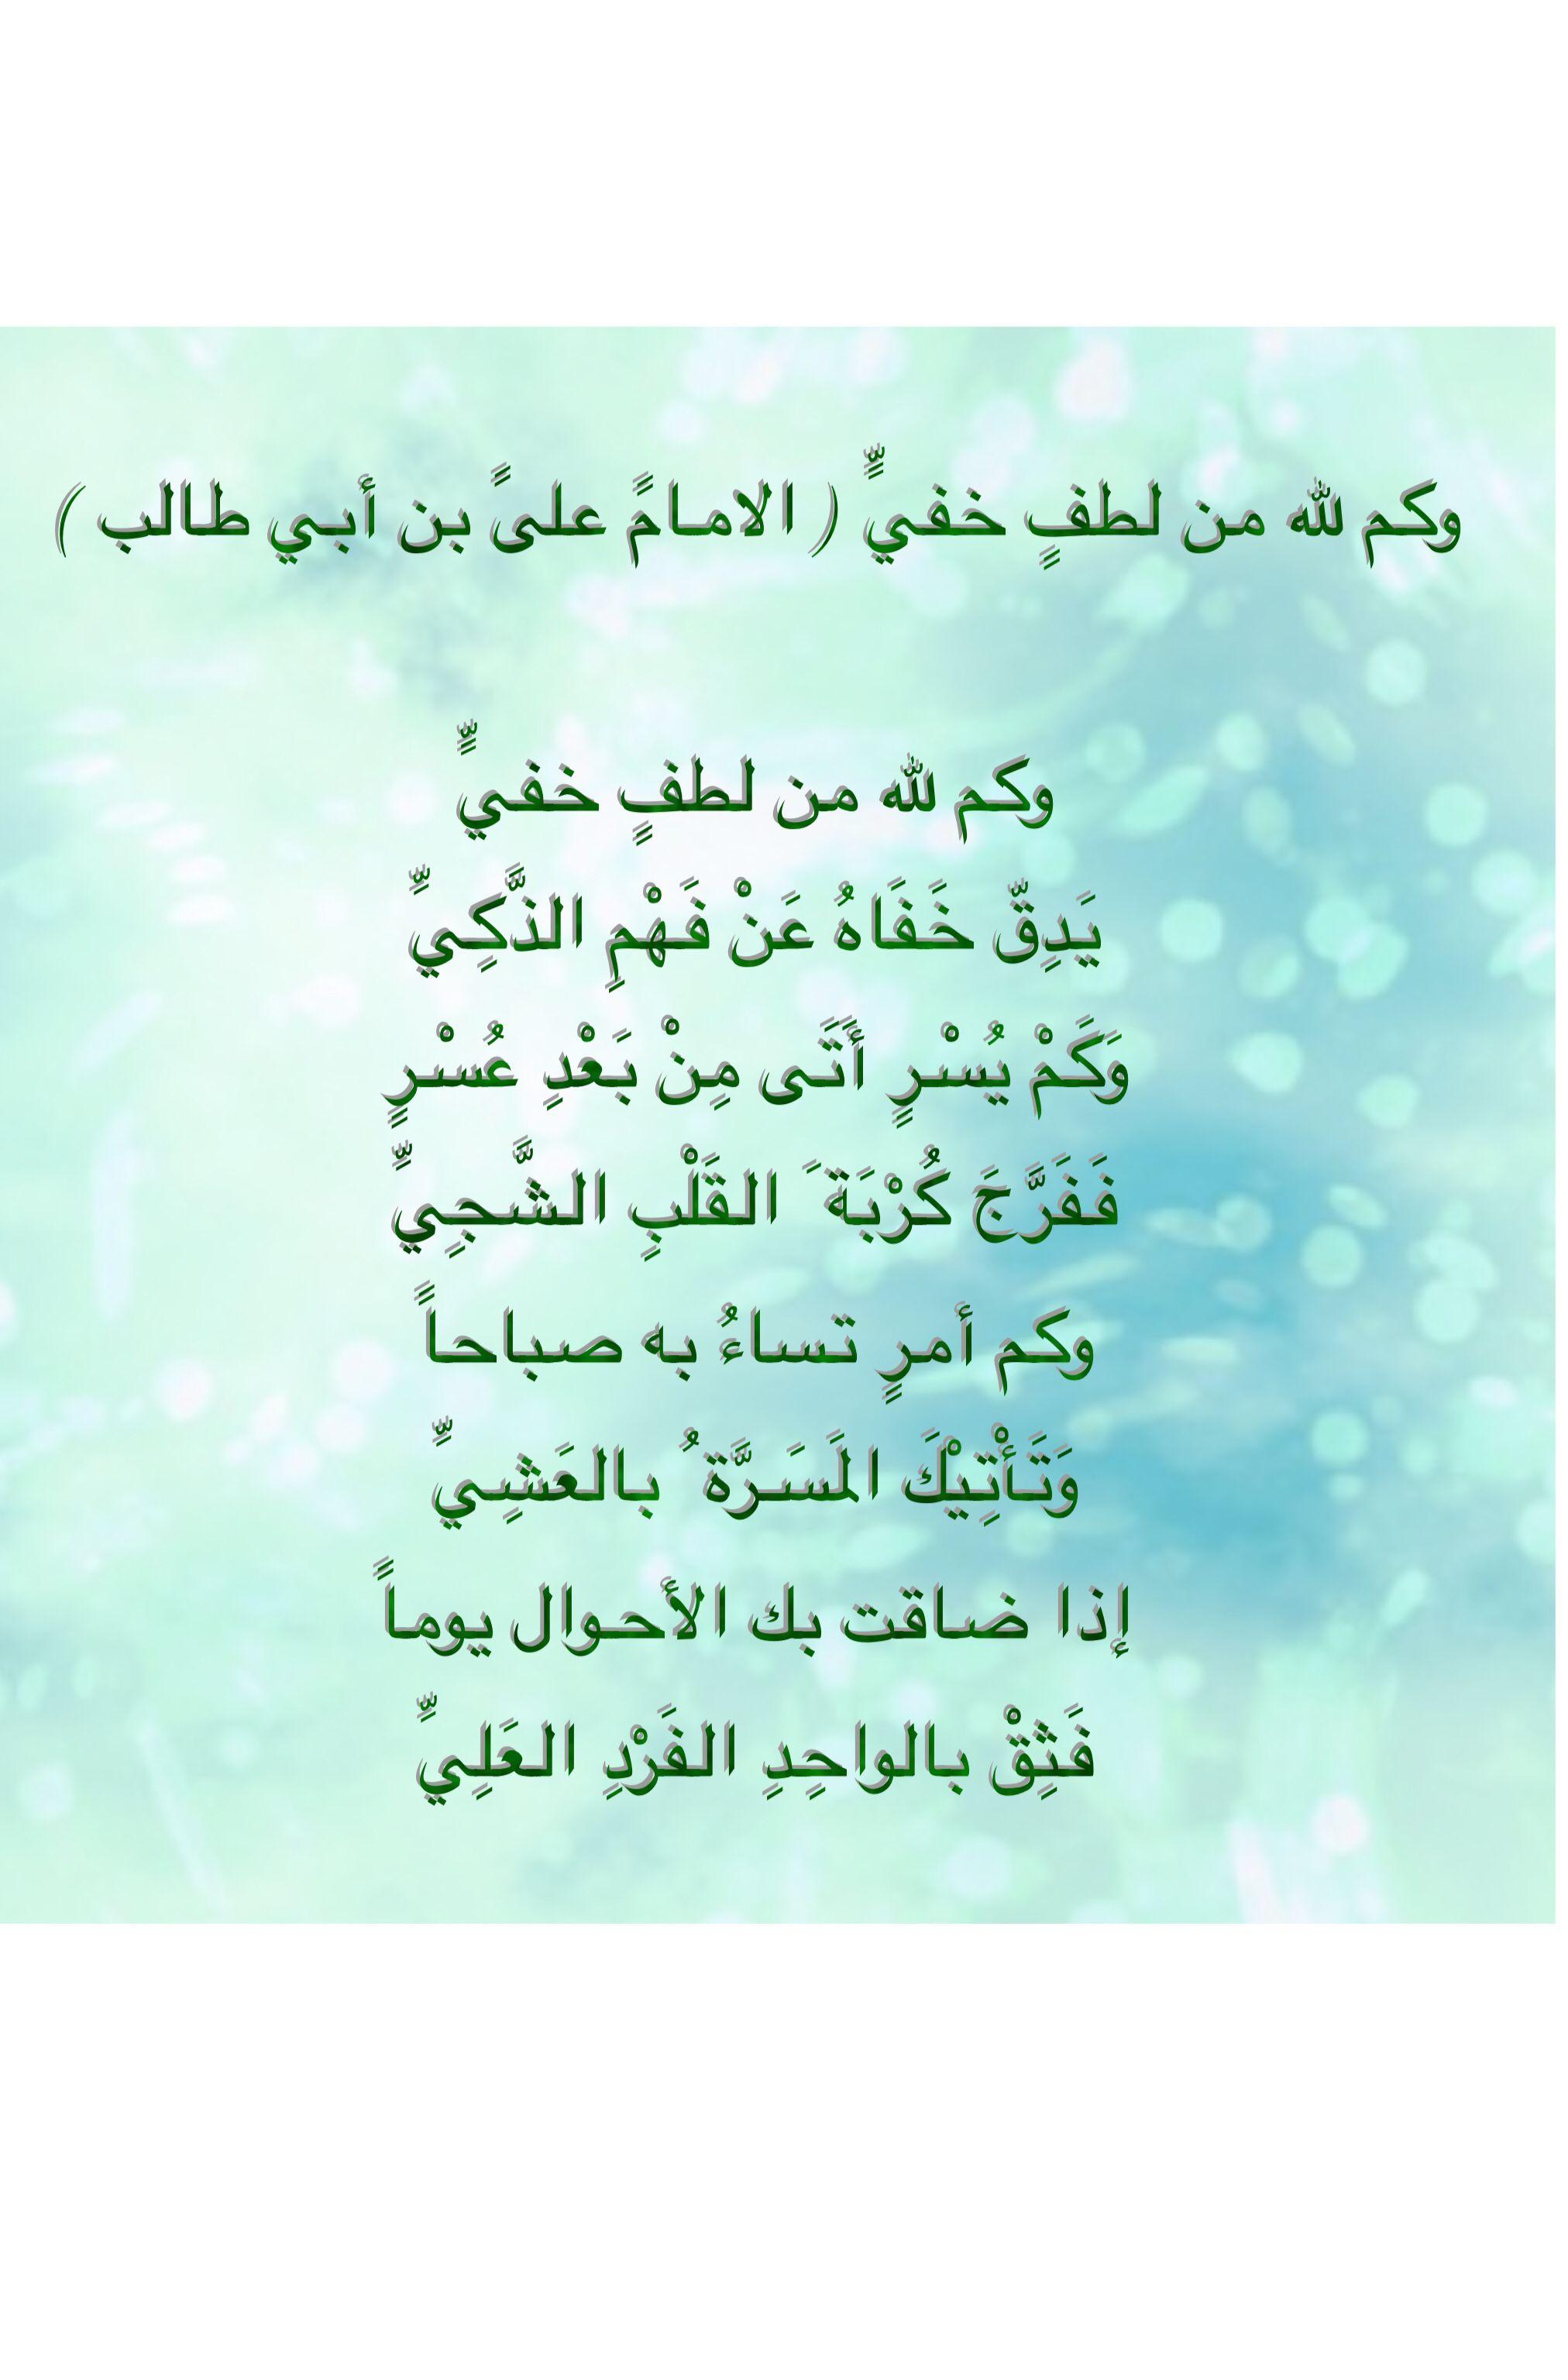 وكم لله من لطف خفي Quotes Words Arabic Quotes